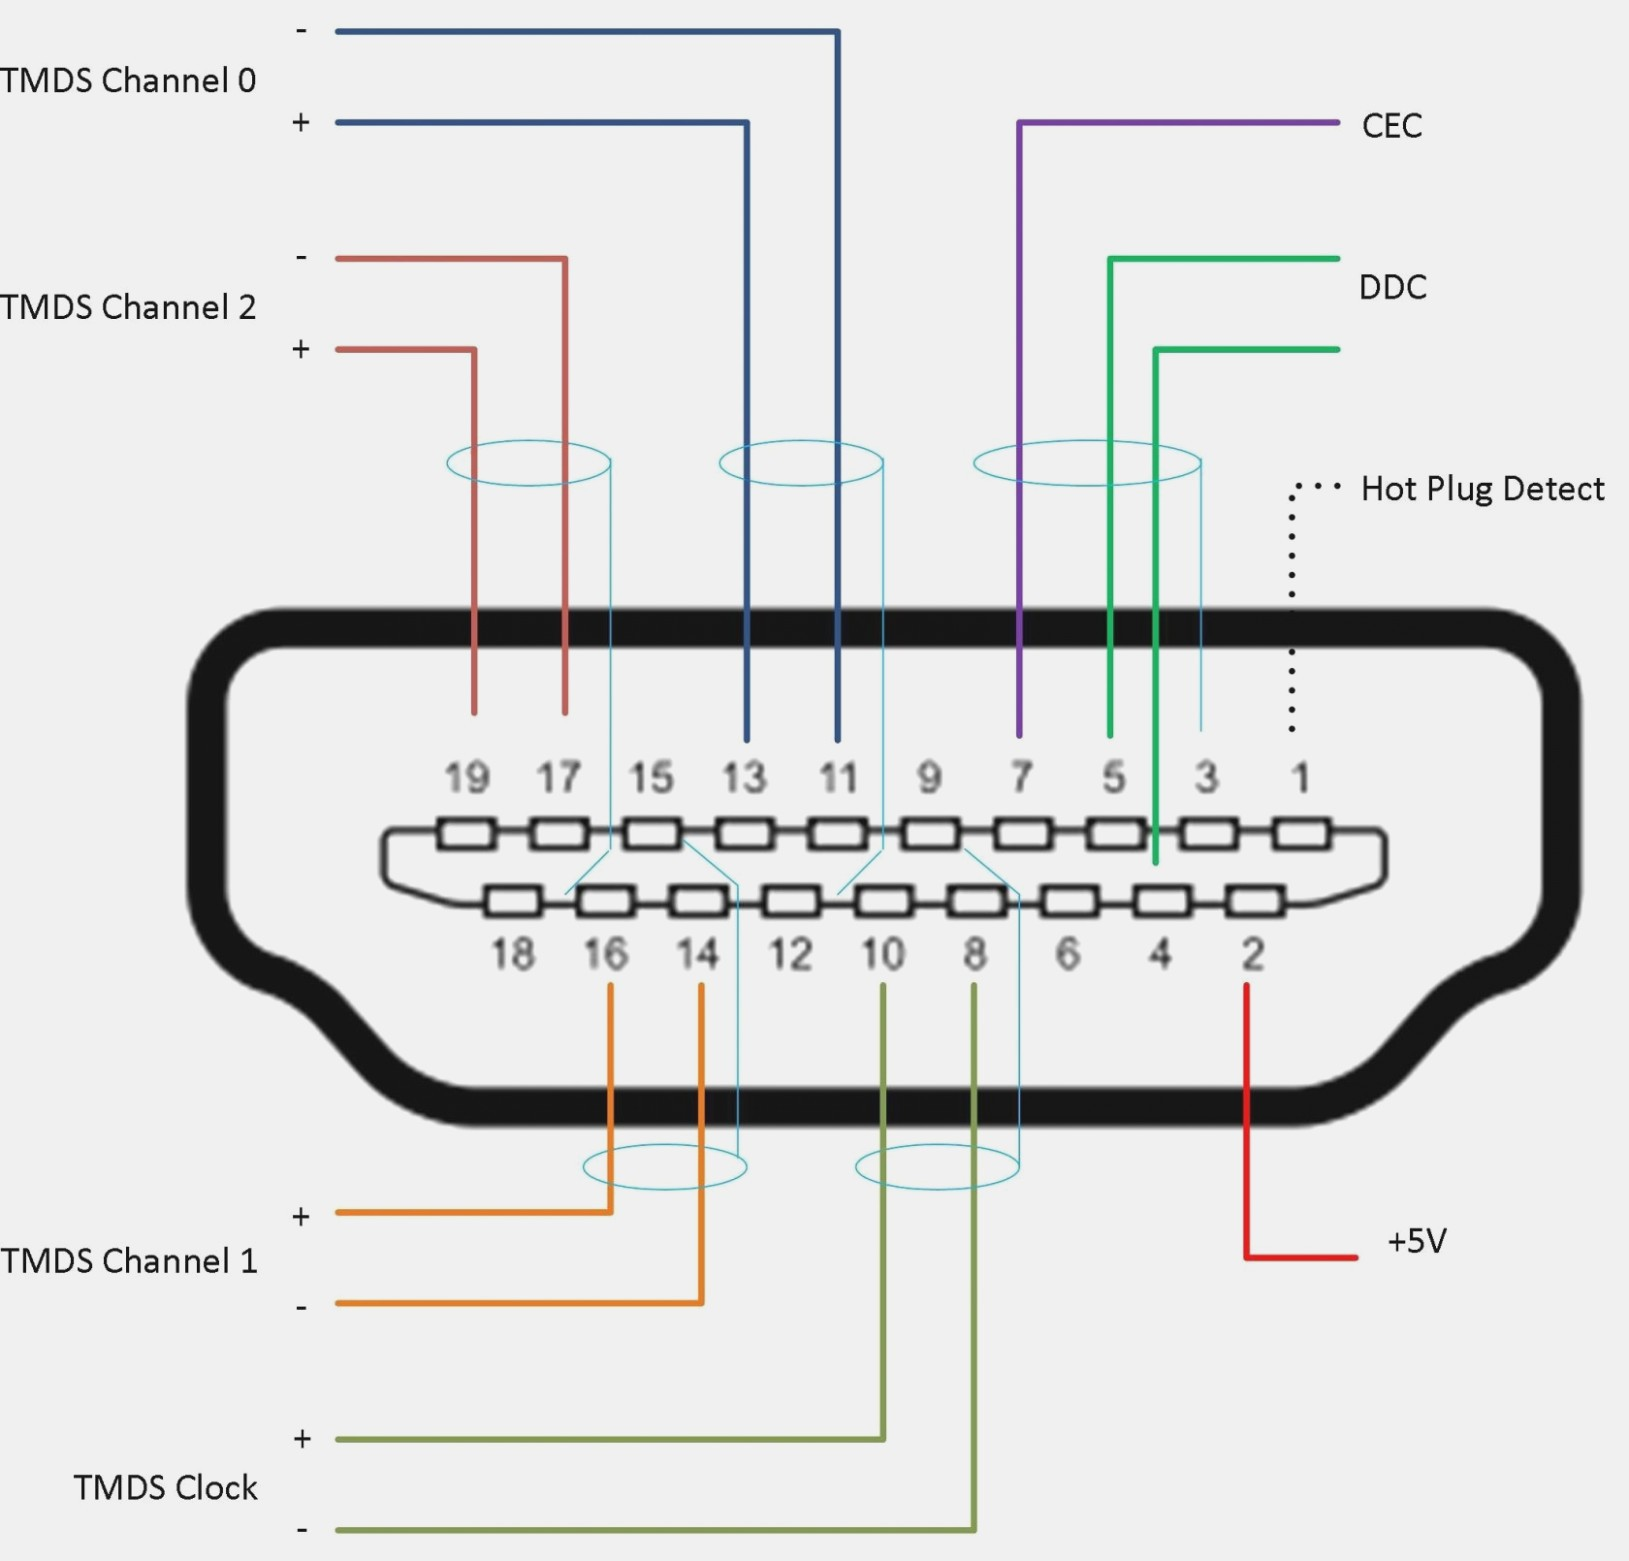 vga to rca adapter wiring diagram wiring library mix tv hdmi wiring diagram simple wiring diagram